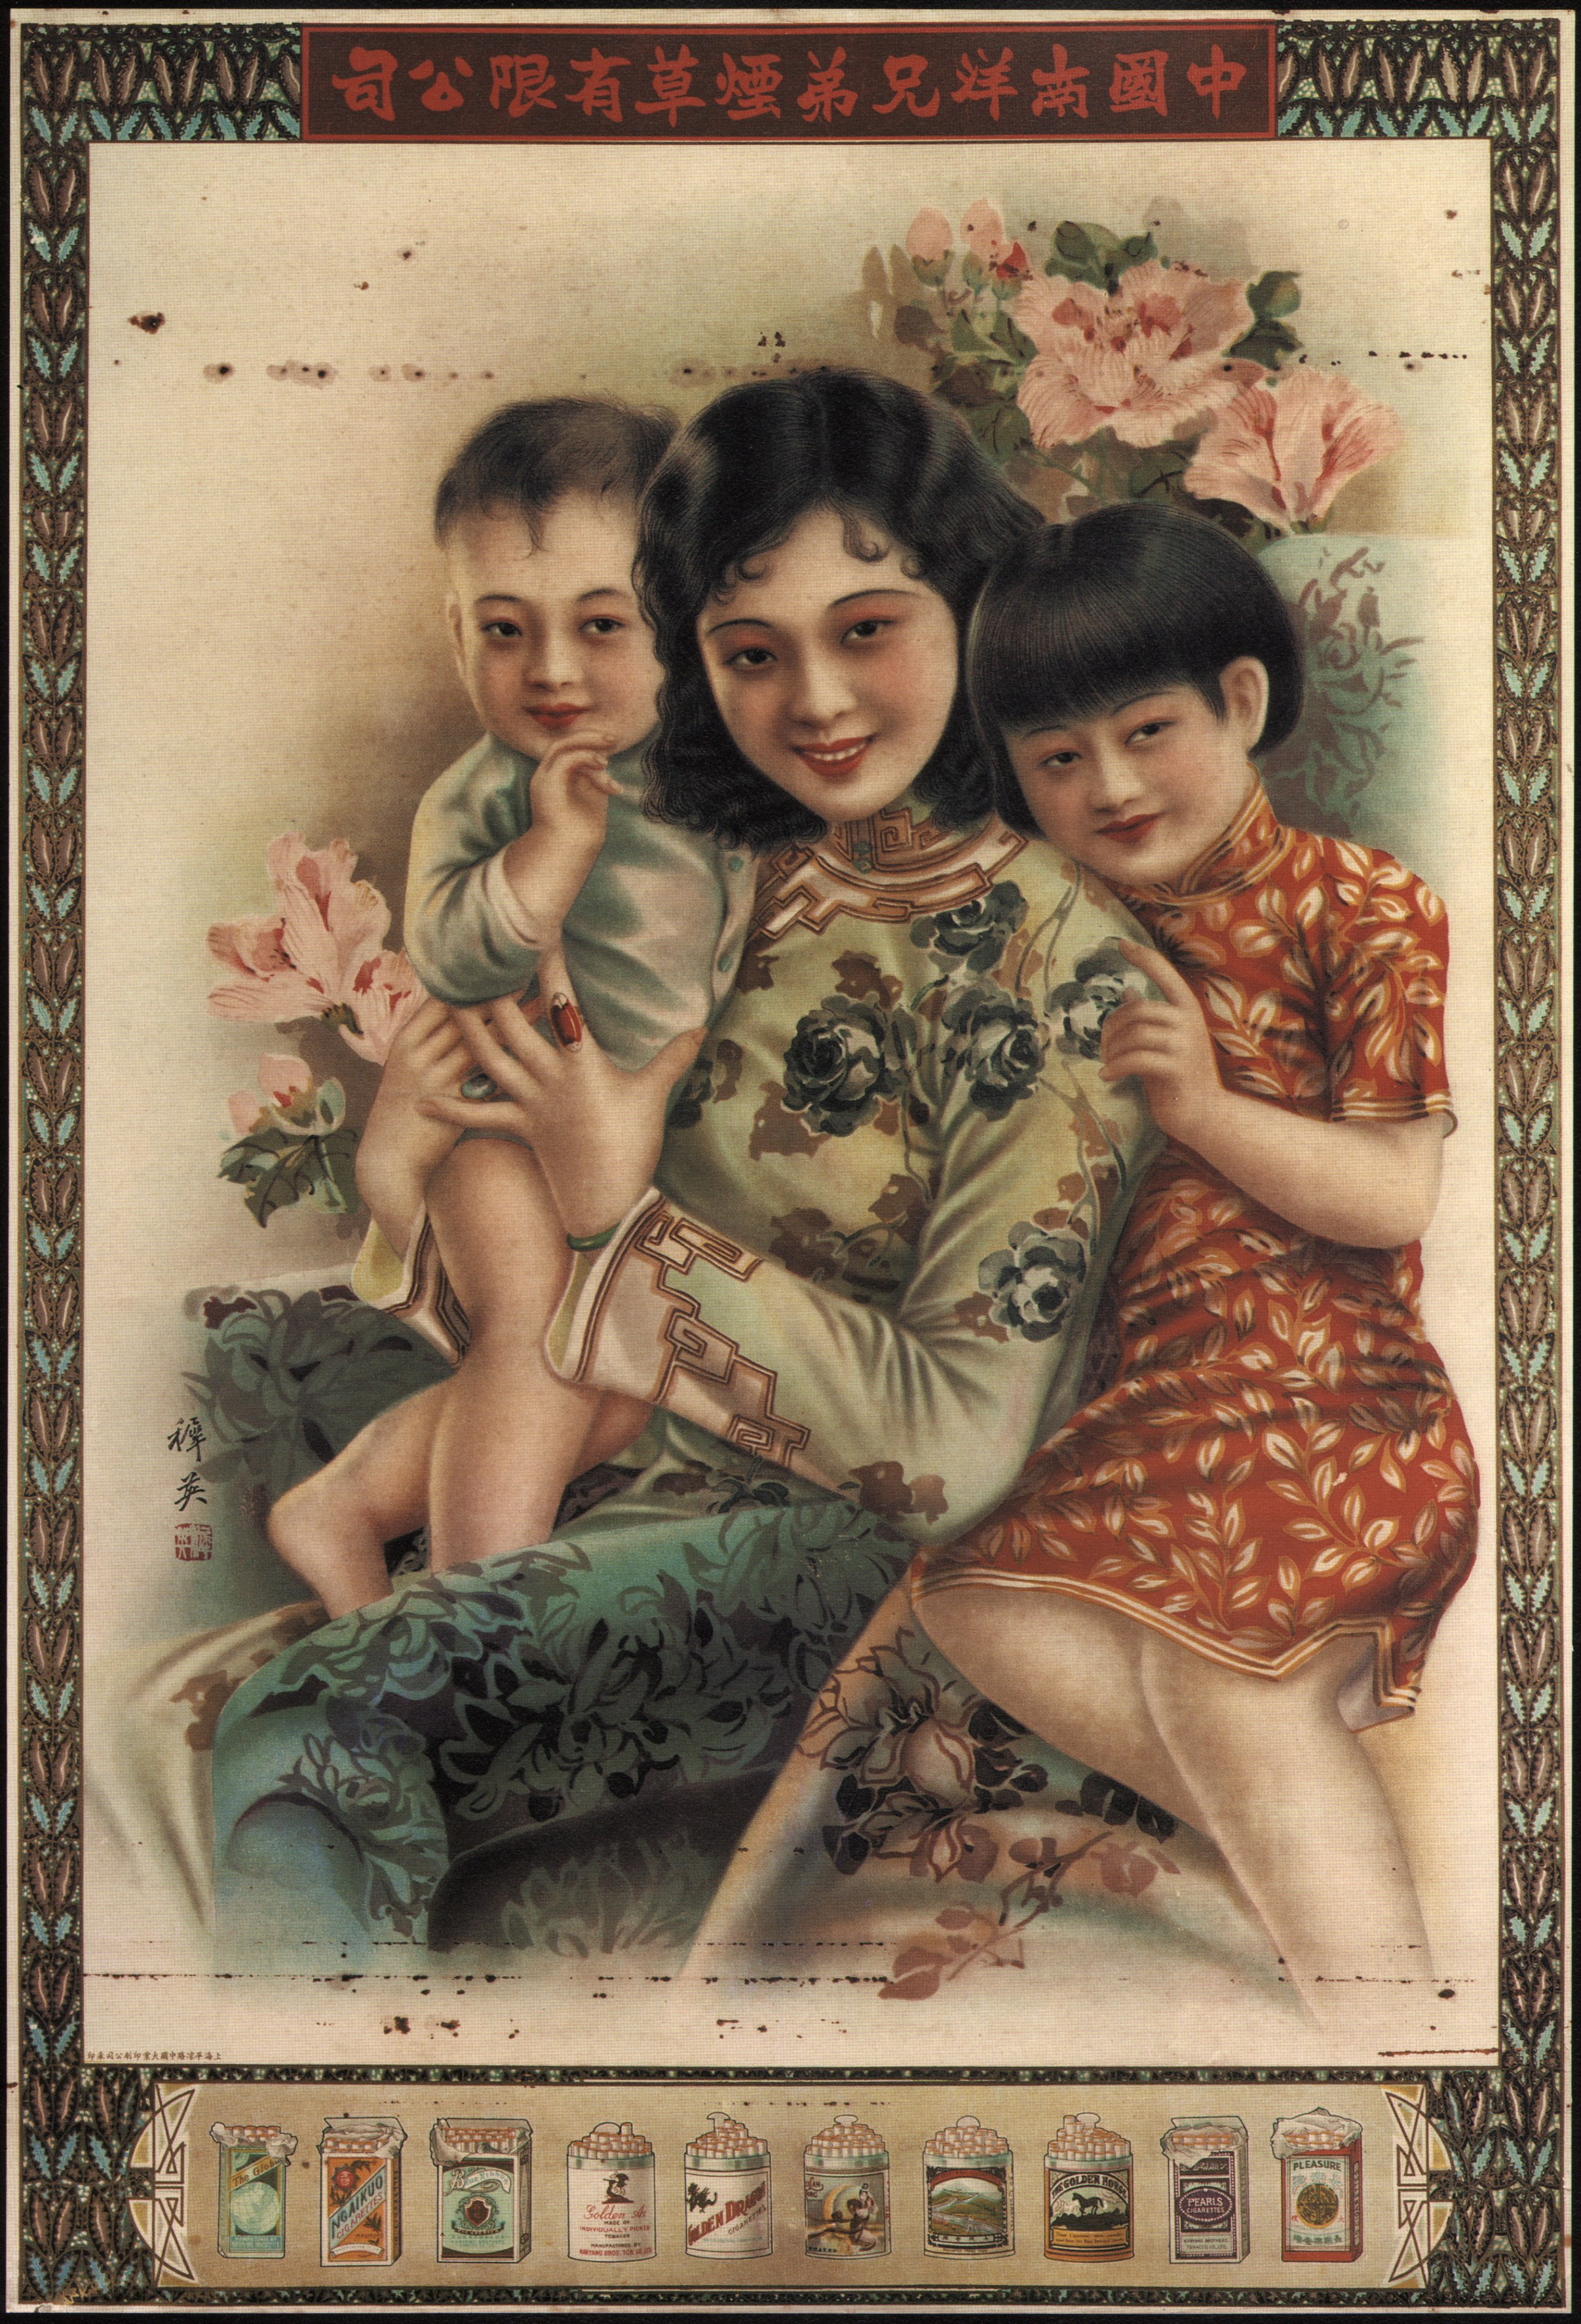 Nanyang-Brothers-Tobacco-Co.-Ltd-Zhou-Baisheng-1920